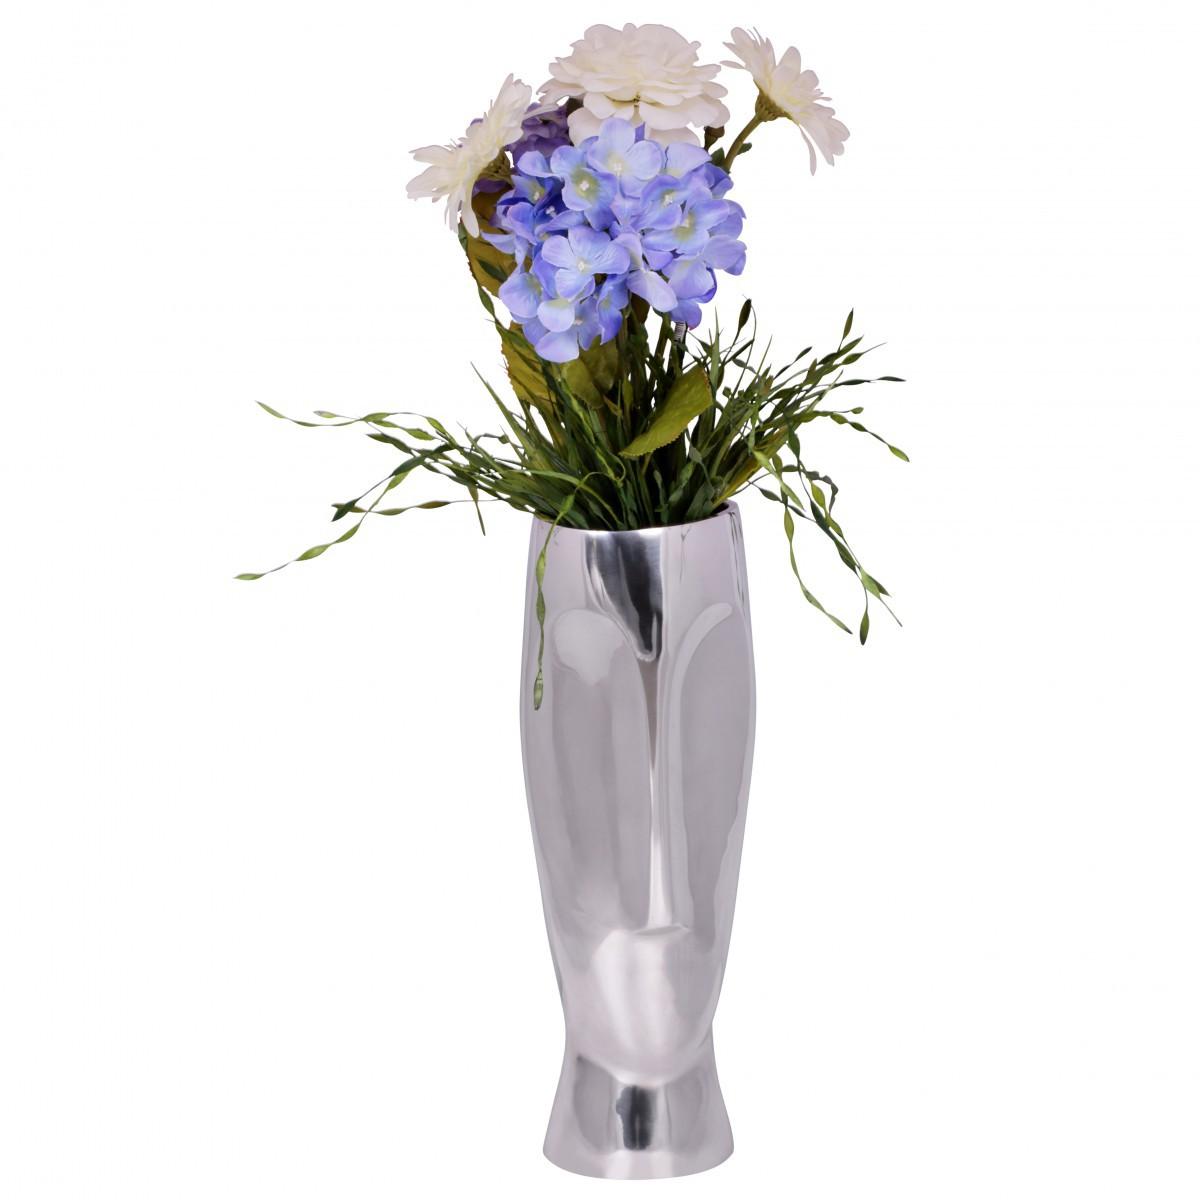 Finebuy deko vase gro trophy aluminium modern mit 1 for Flurgarderobe schmal